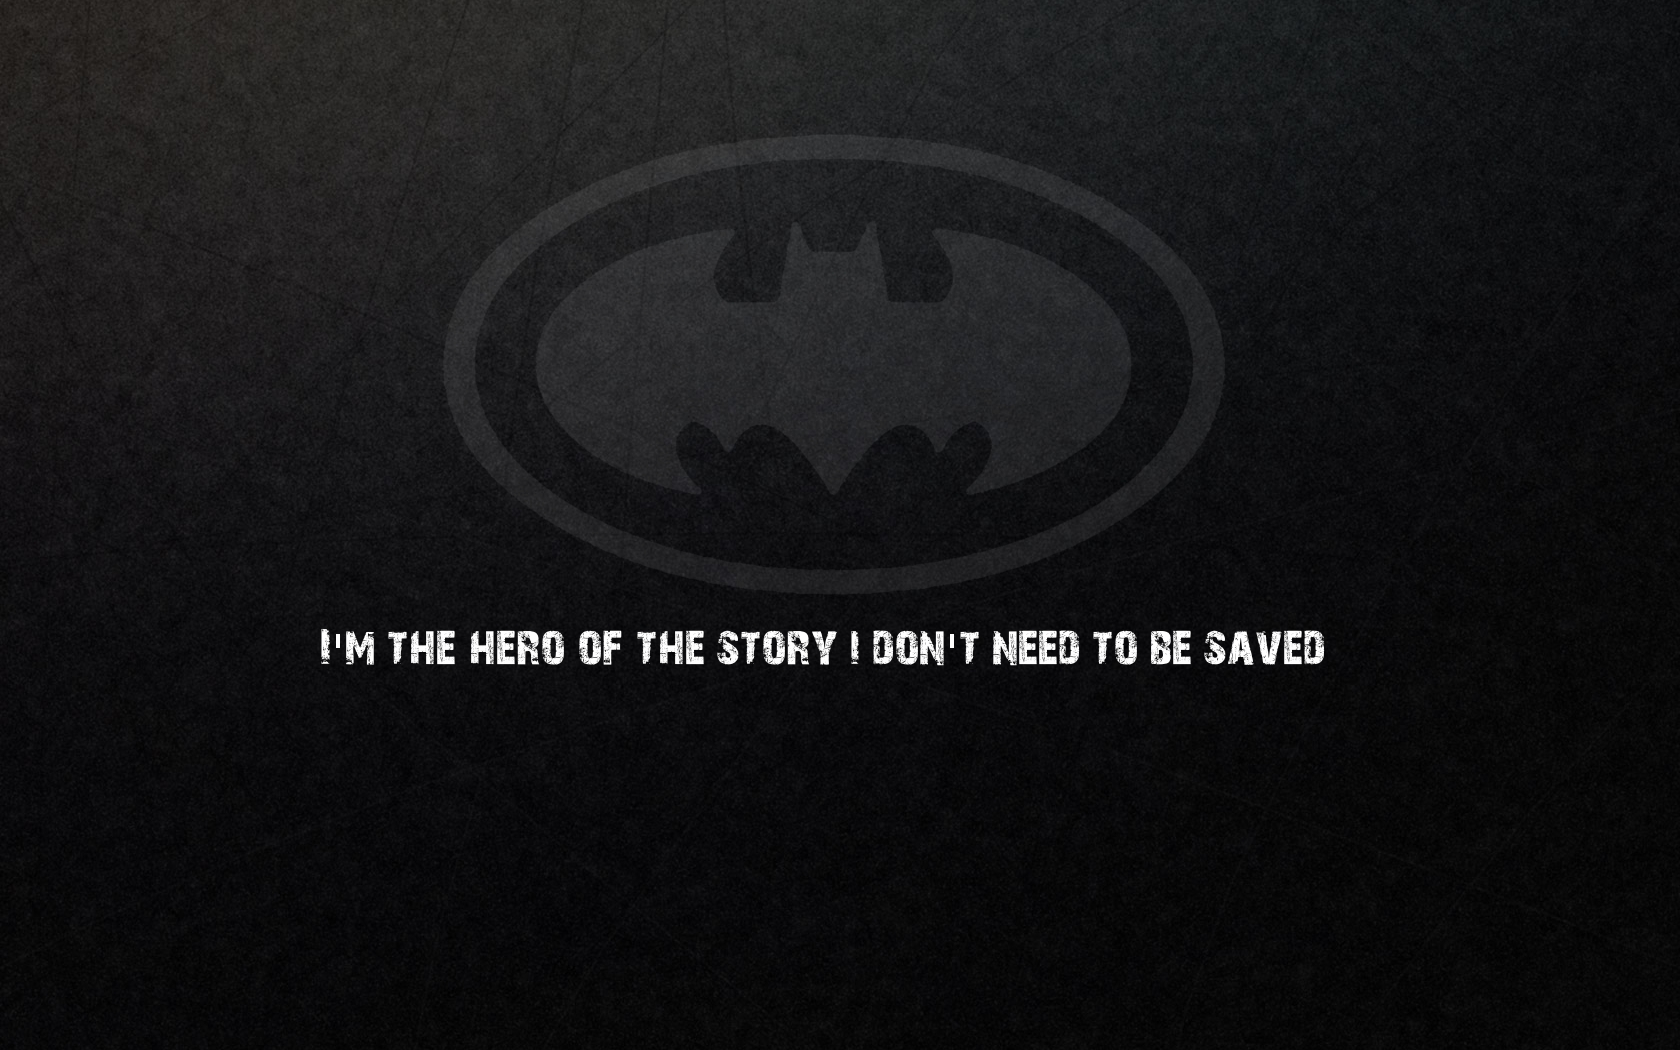 Batman quote #4